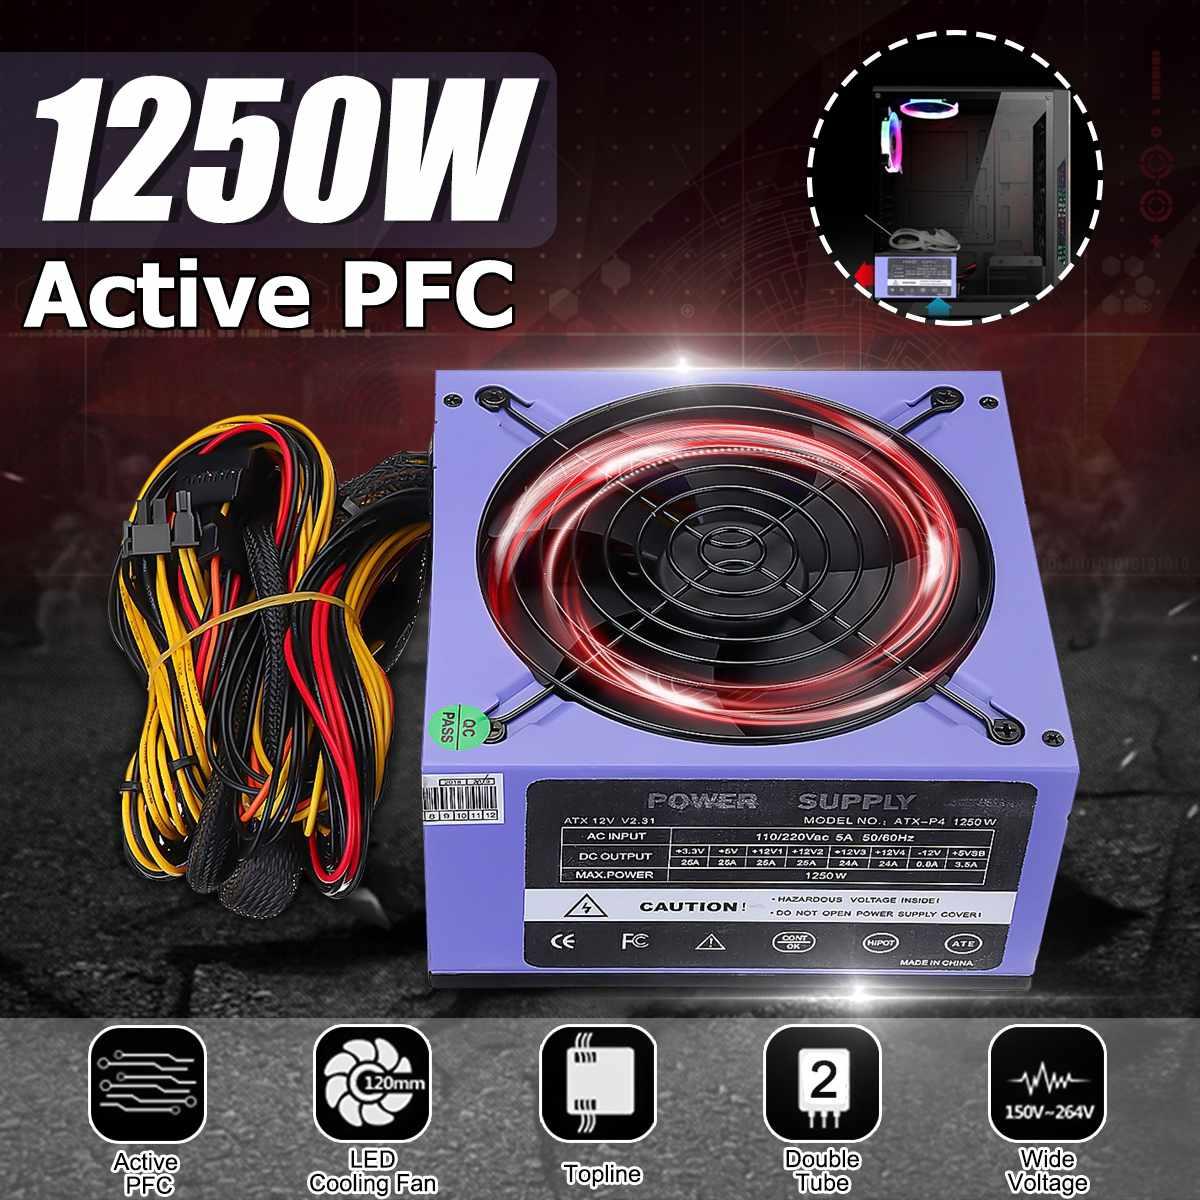 Fuente de alimentación de PC de doble tubo de 1250W 12cm ventilador LED 24 pines PCI SATA ATX AMD PFC 12V fuente de alimentación de Juegos de ordenador para PC de escritorio